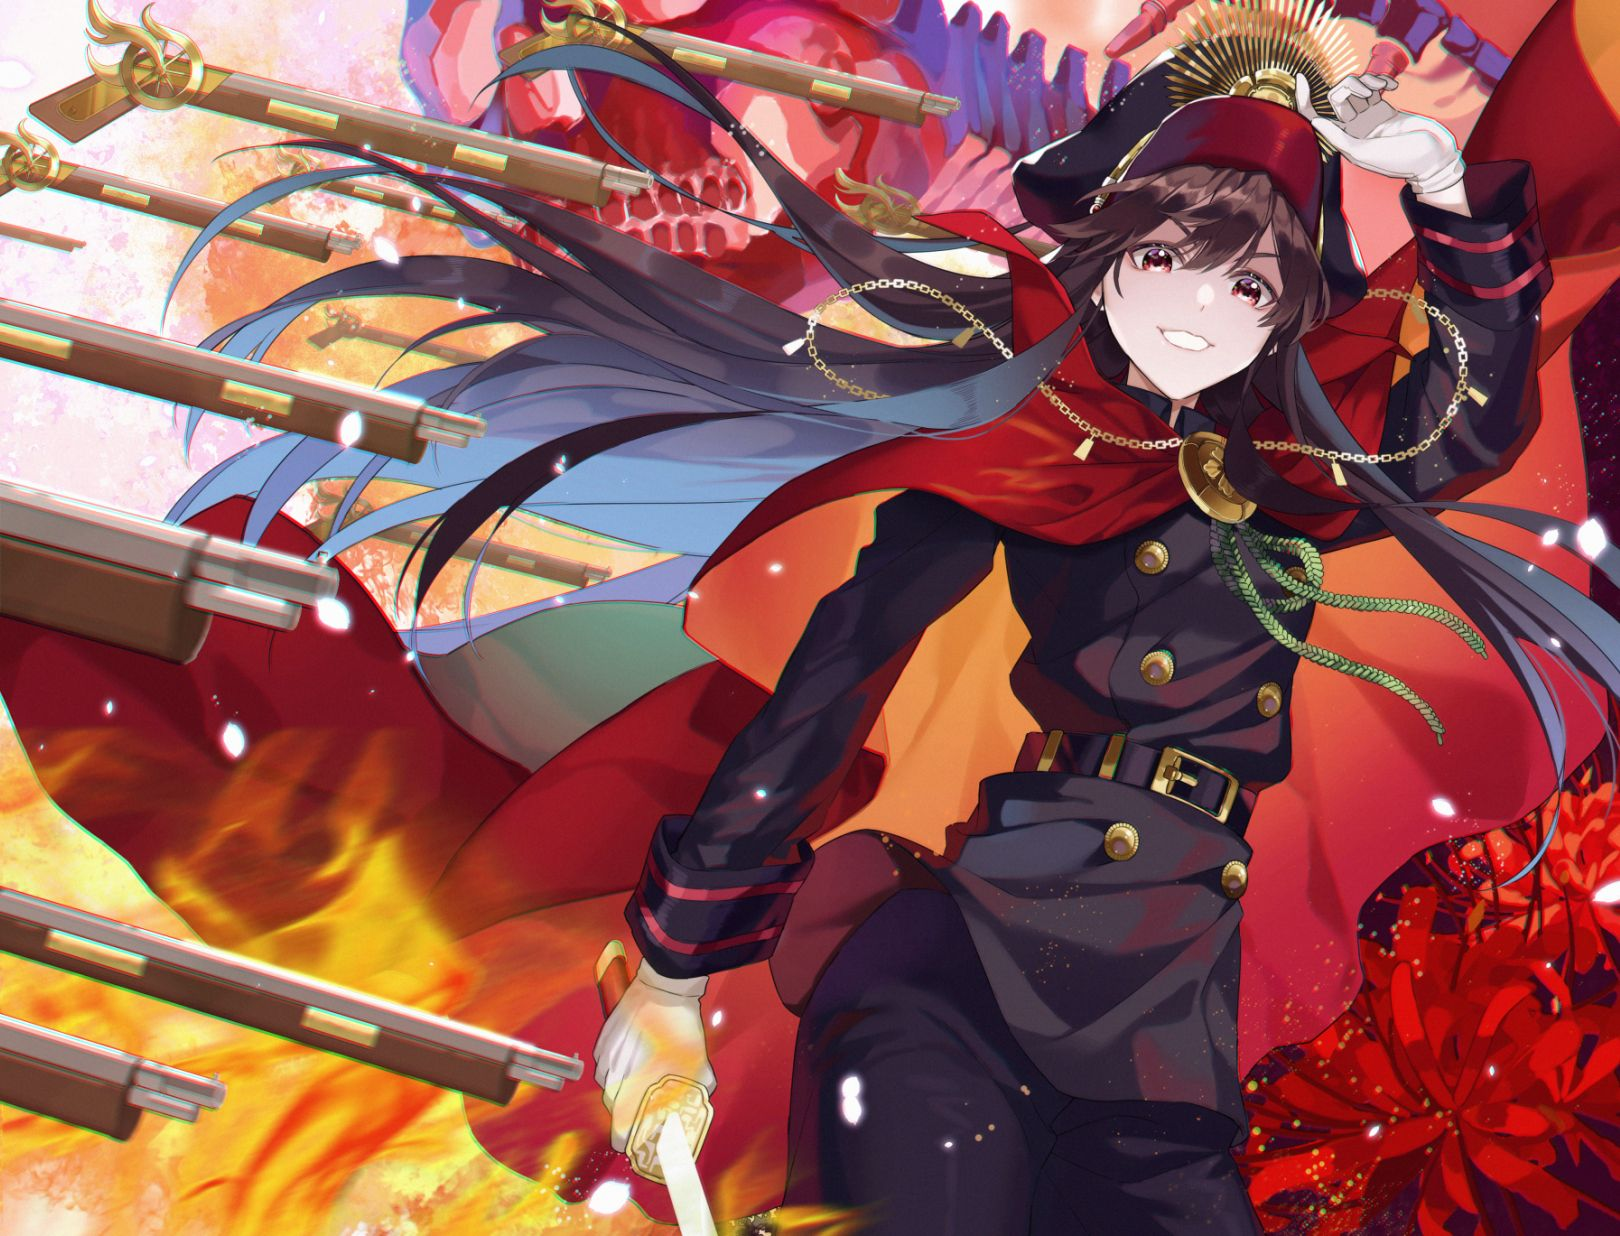 Oda Nobunaga Fate Grand Order One Punch Anime Fate Stay Night Series Manga Illustration